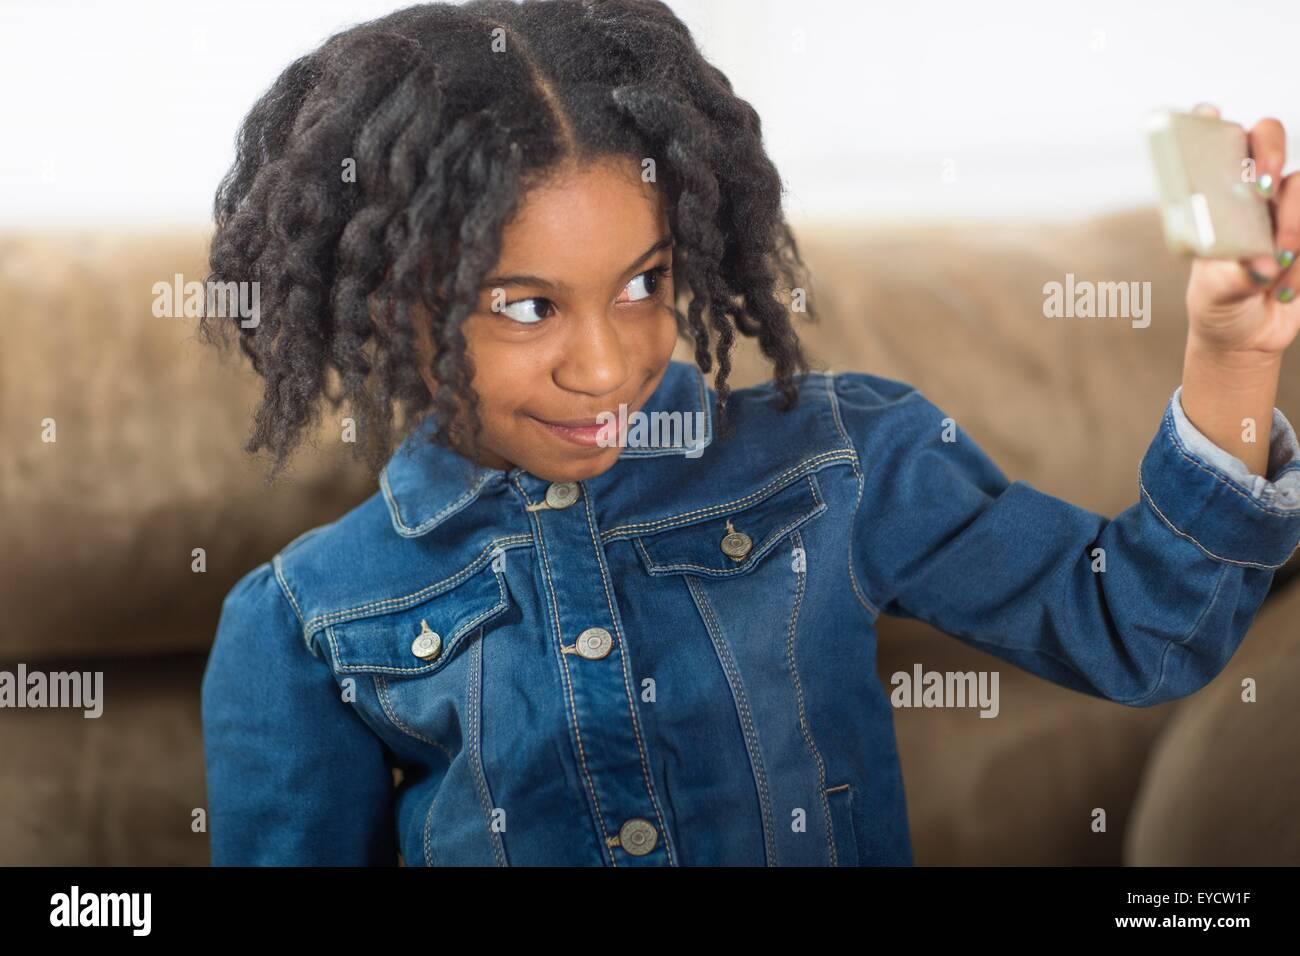 Girl posing for smartphone selfie on sofa - Stock Image